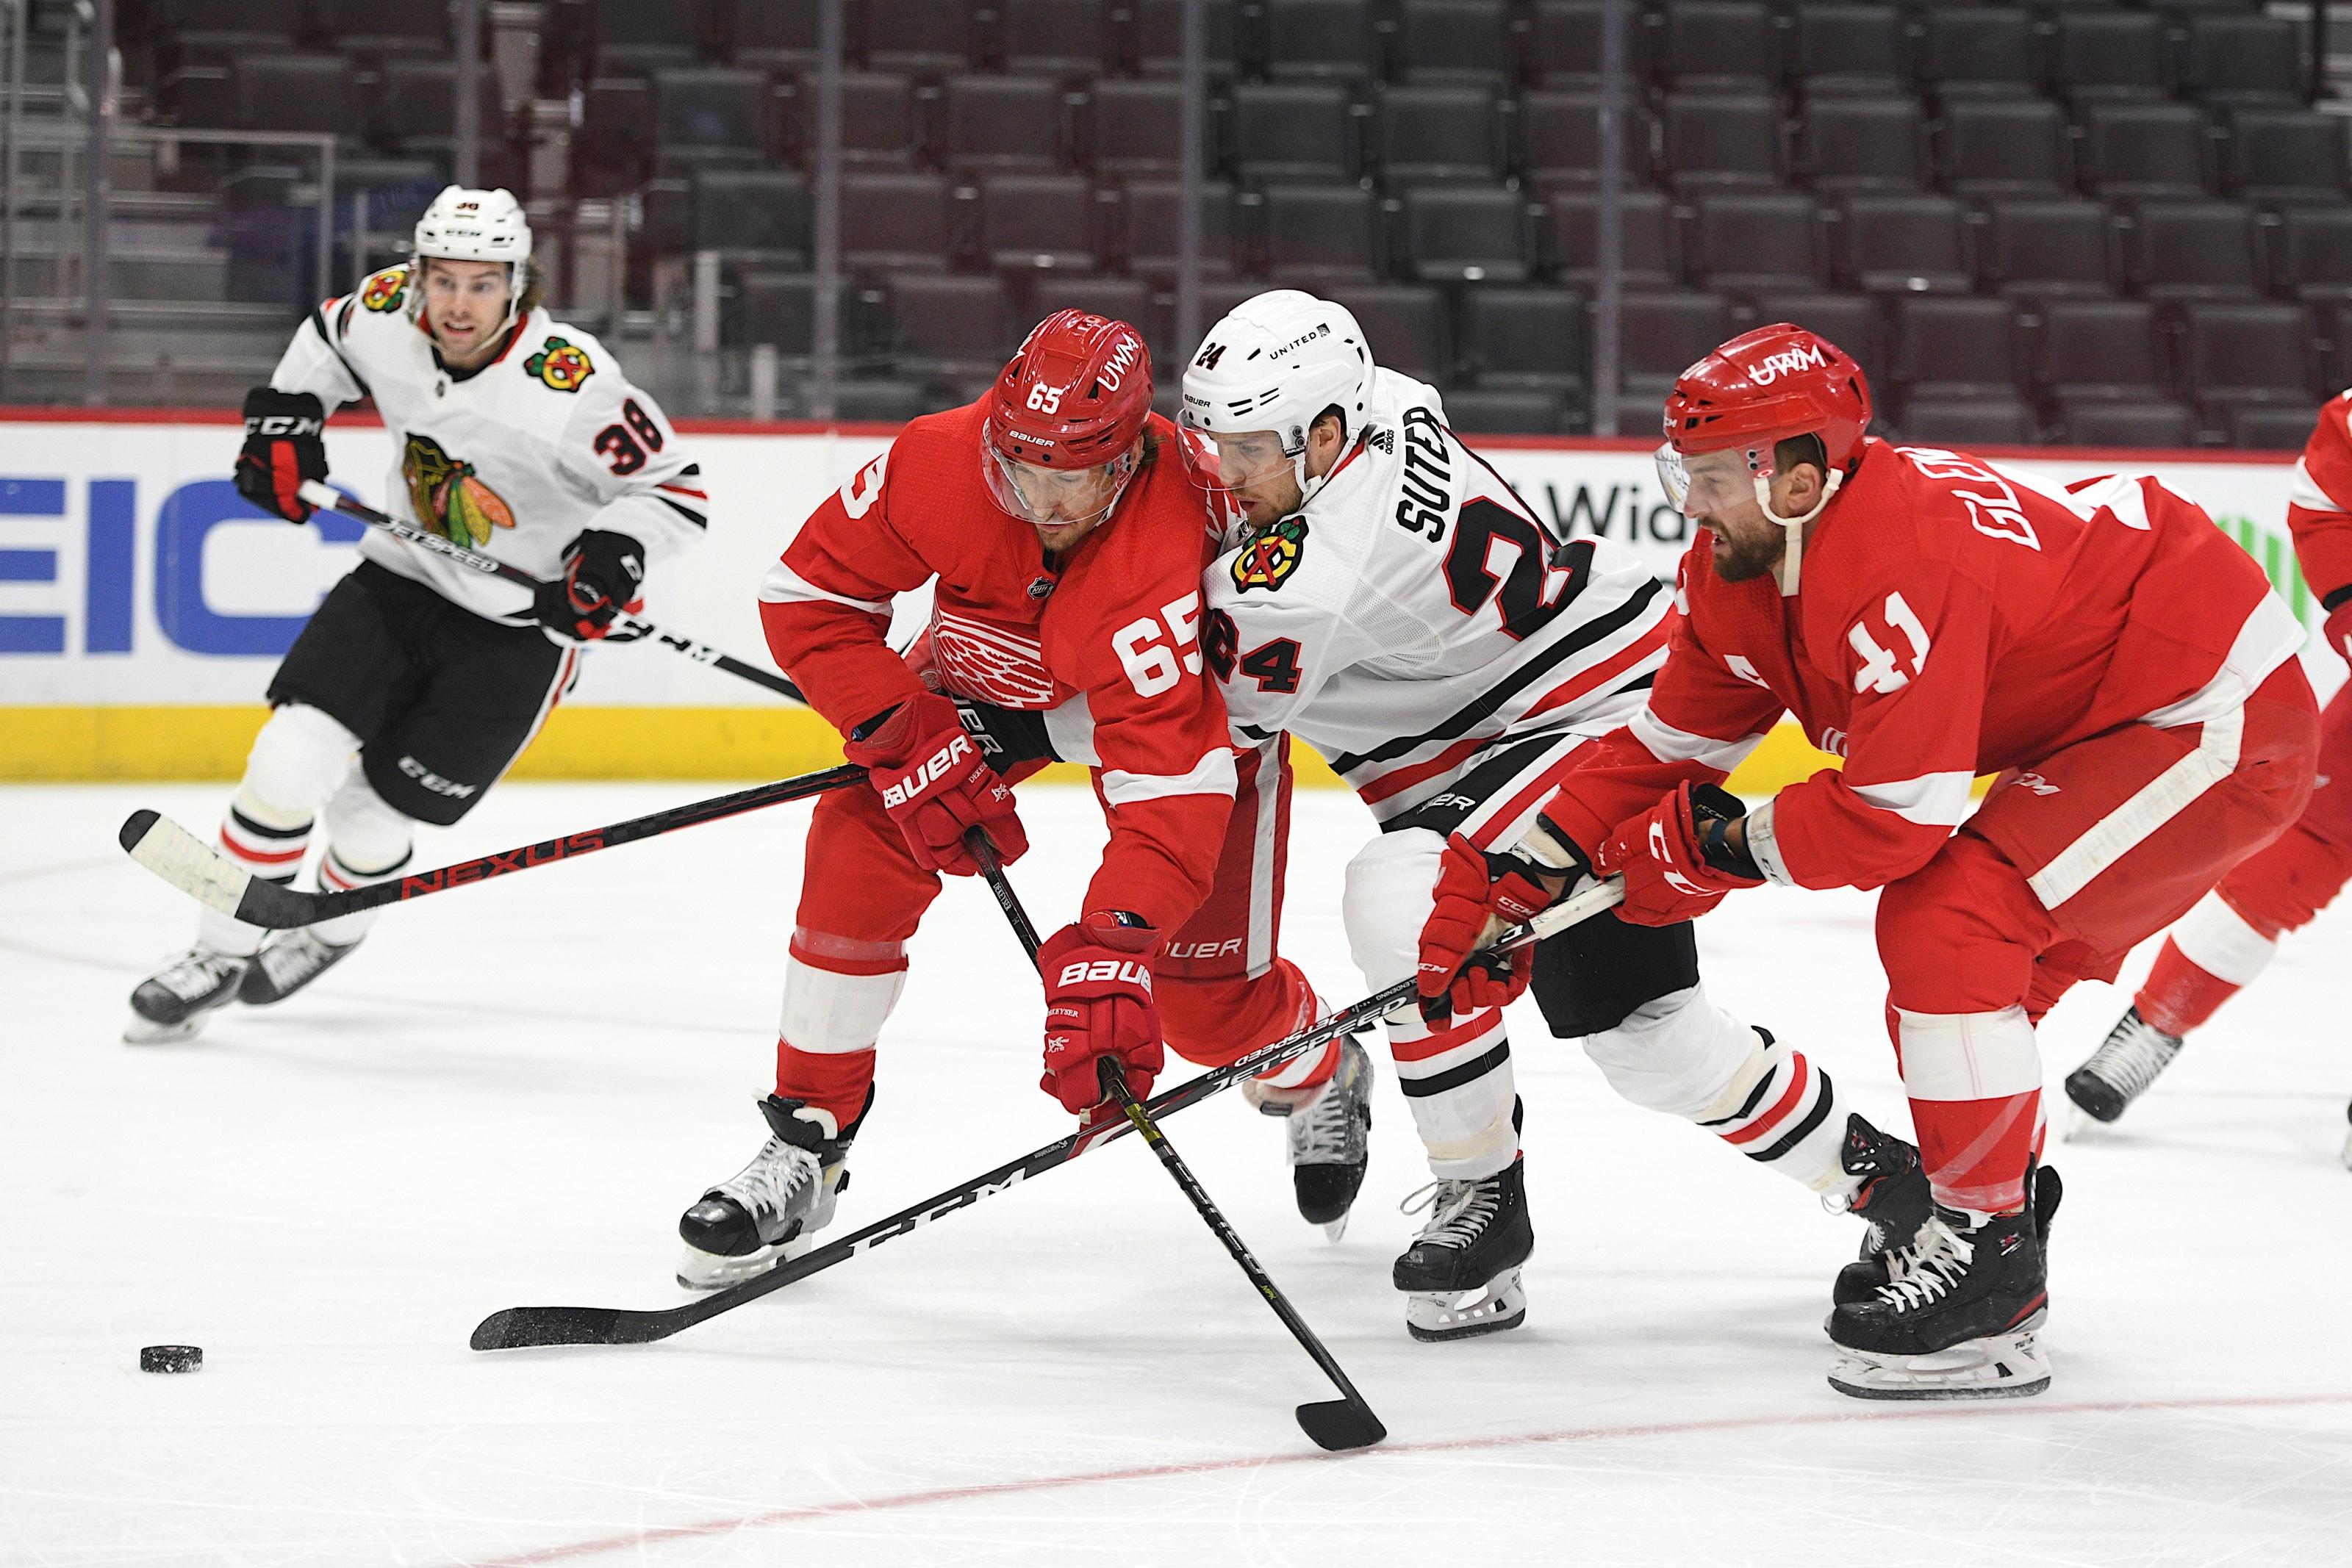 NHL: Chicago Blackhawks at Detroit Red Wings